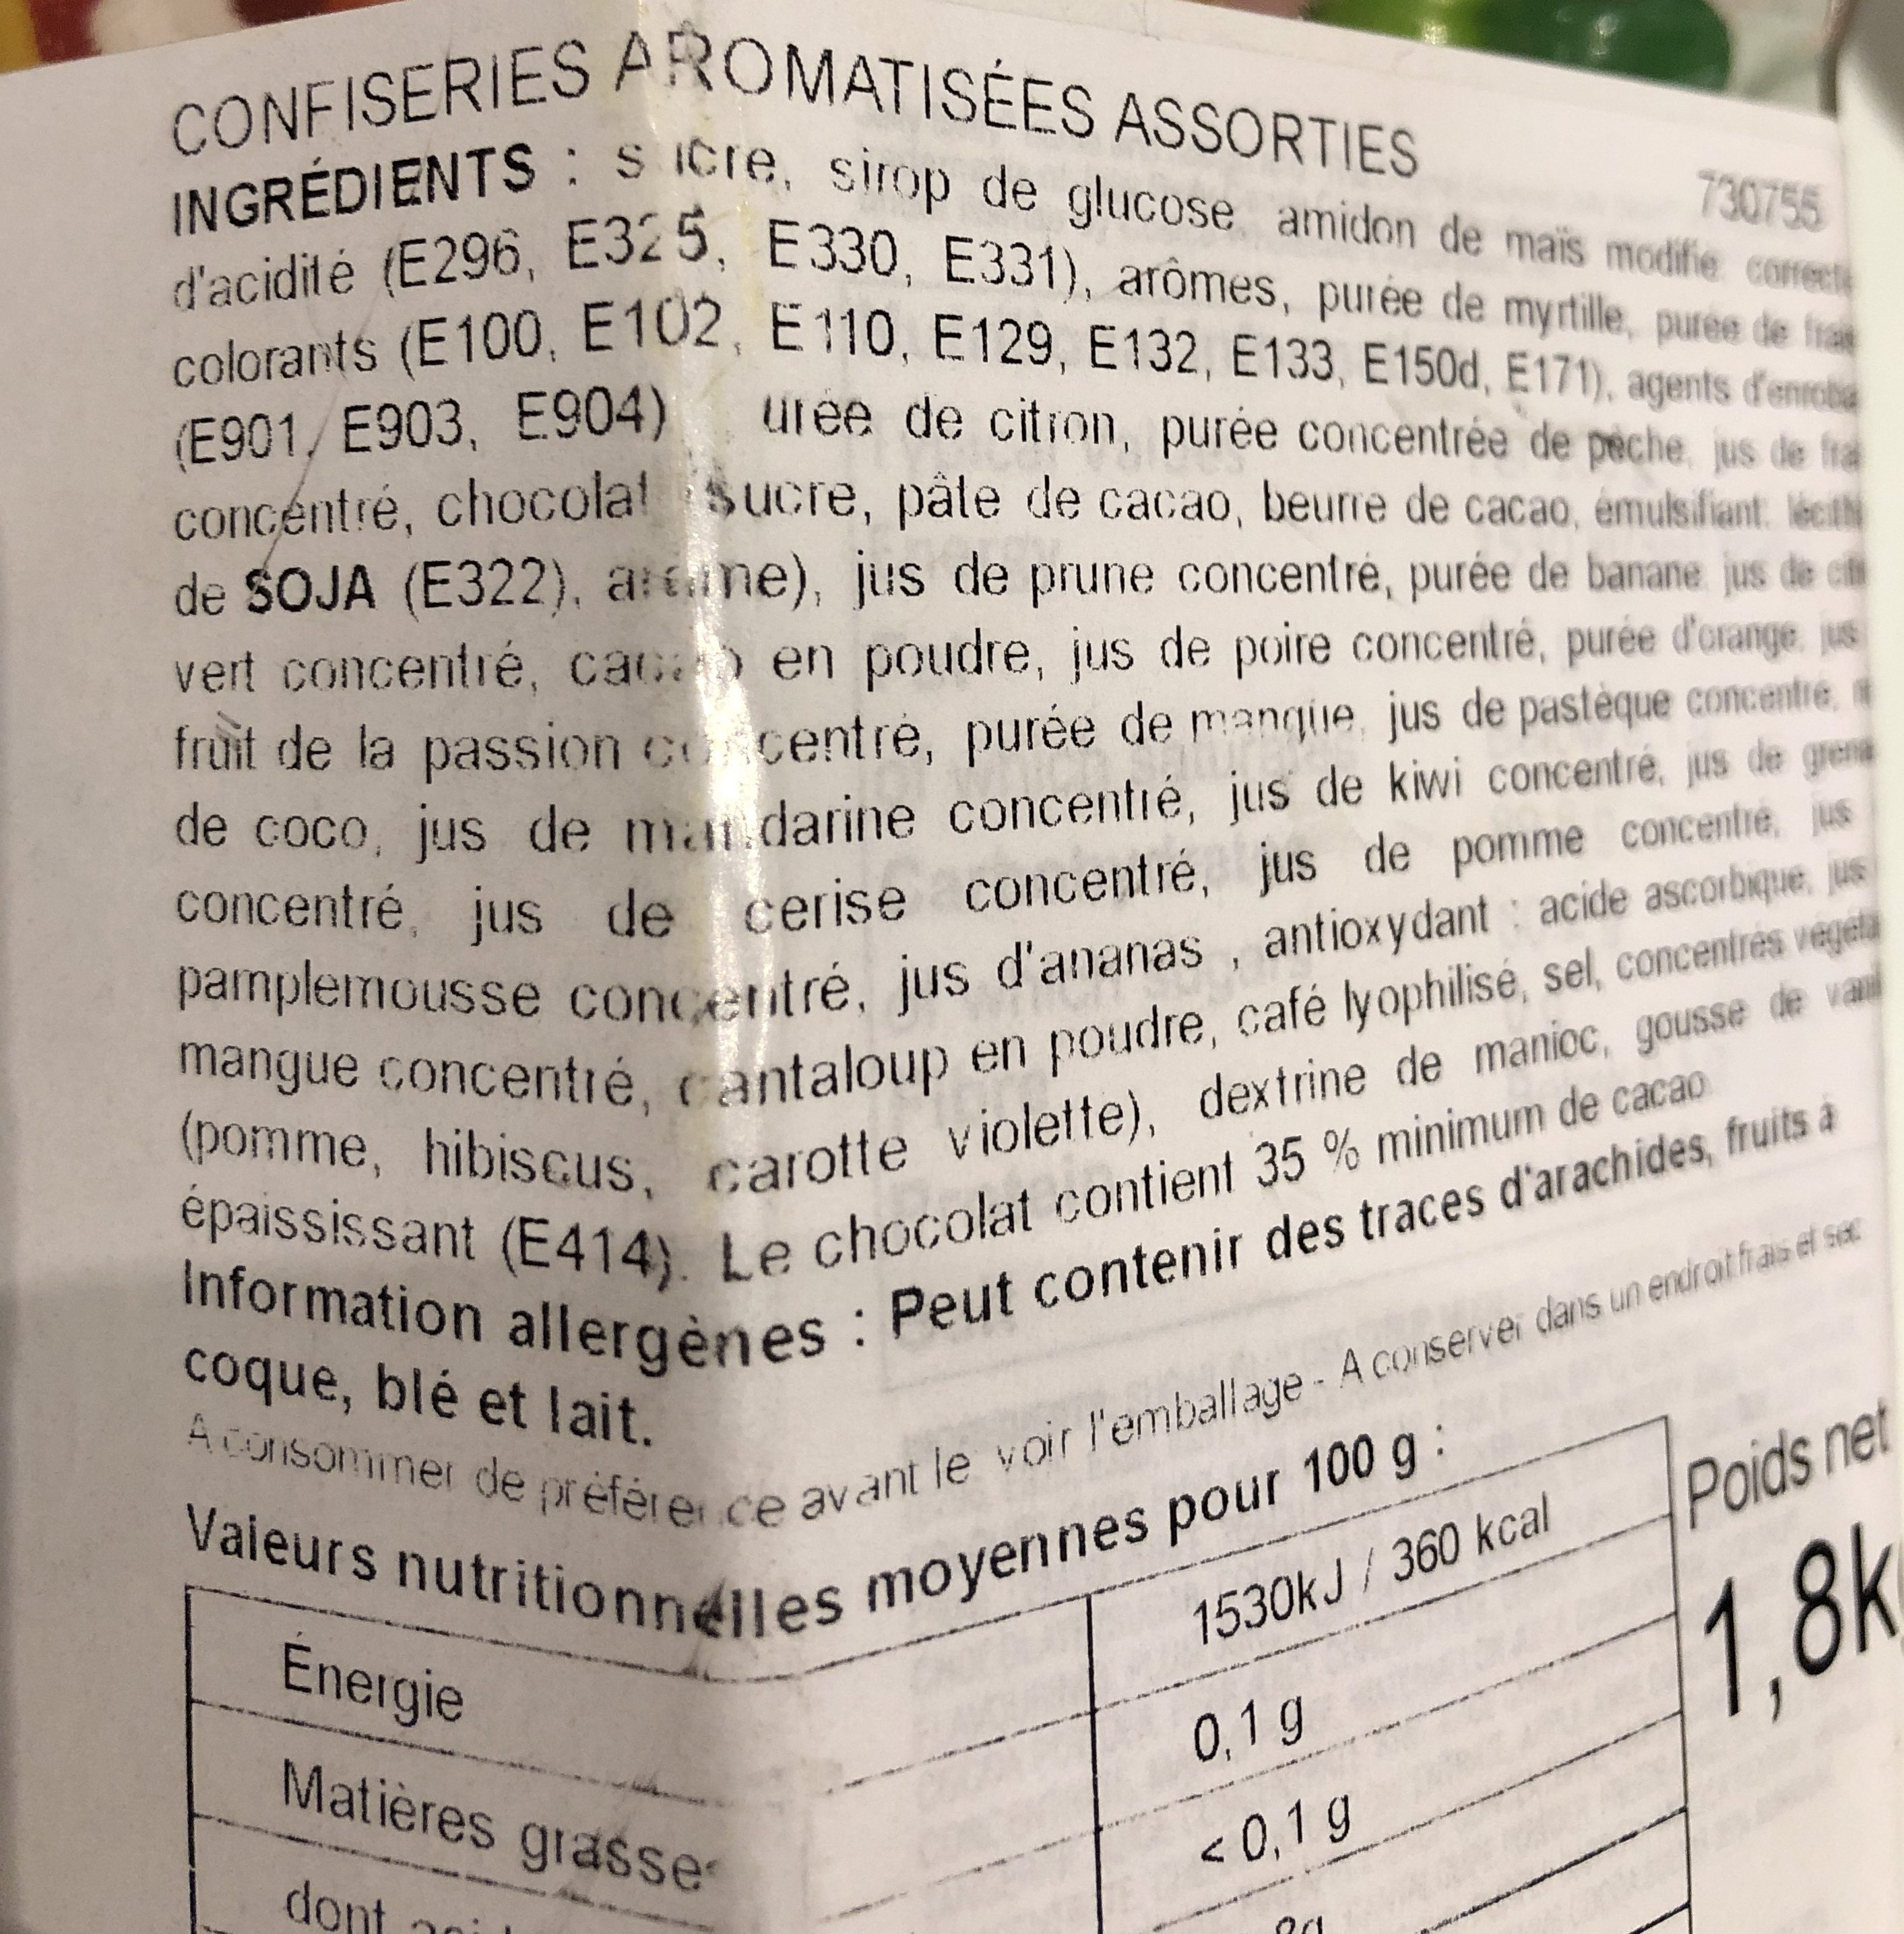 American Jelly Belly 45 Flavour Jar - 1.8KG - Ingredientes